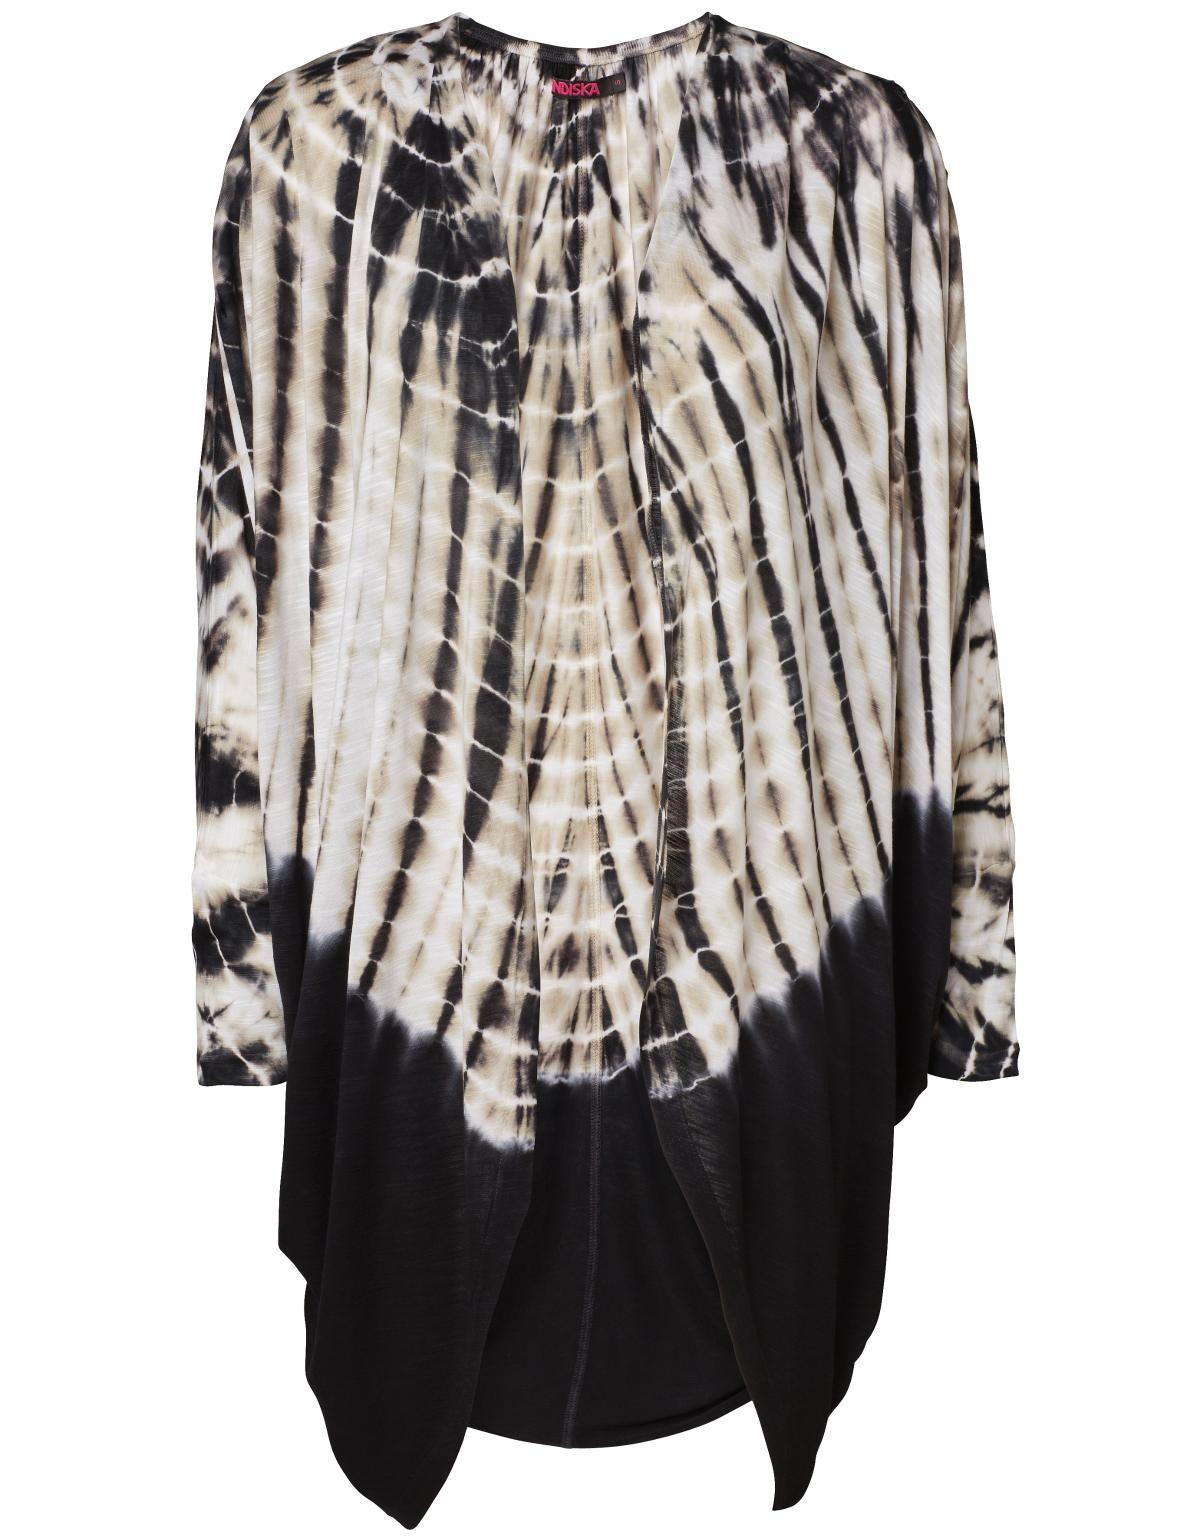 VEGA topp offwhite   Print   Jersey top   Toppar   Kläder   INDISKA Shop Online